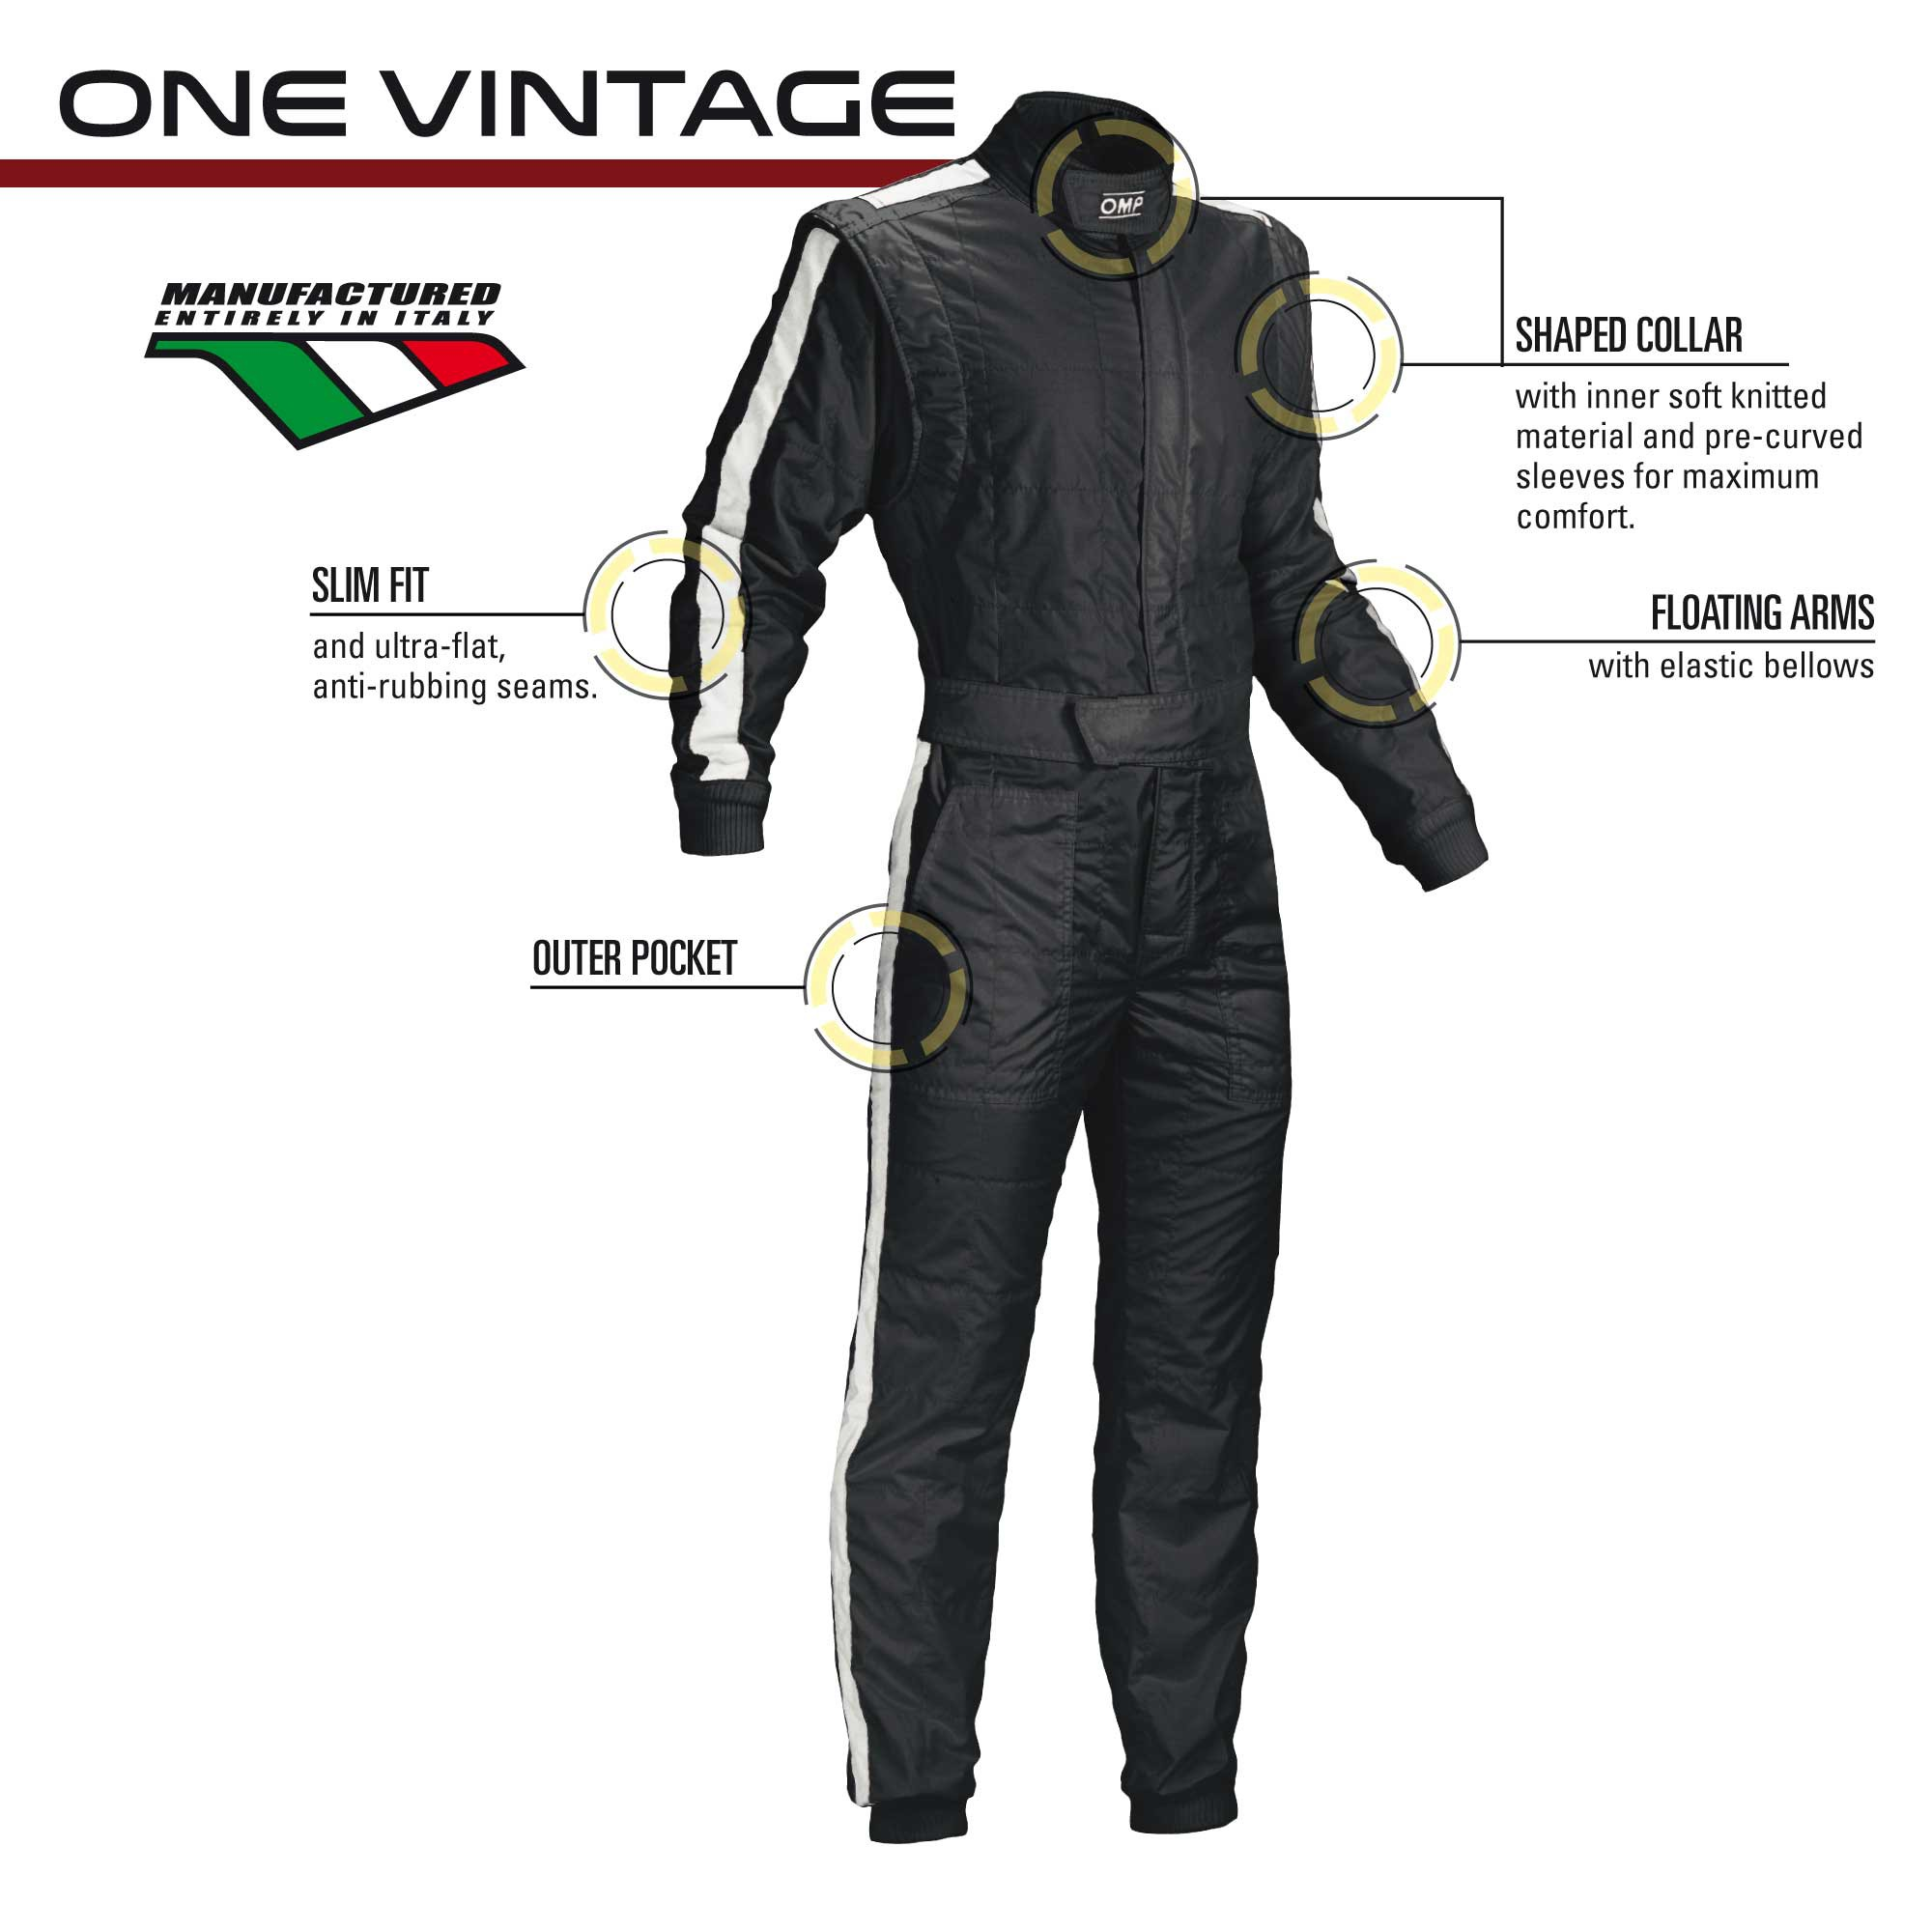 ONE VINTAGE Suit